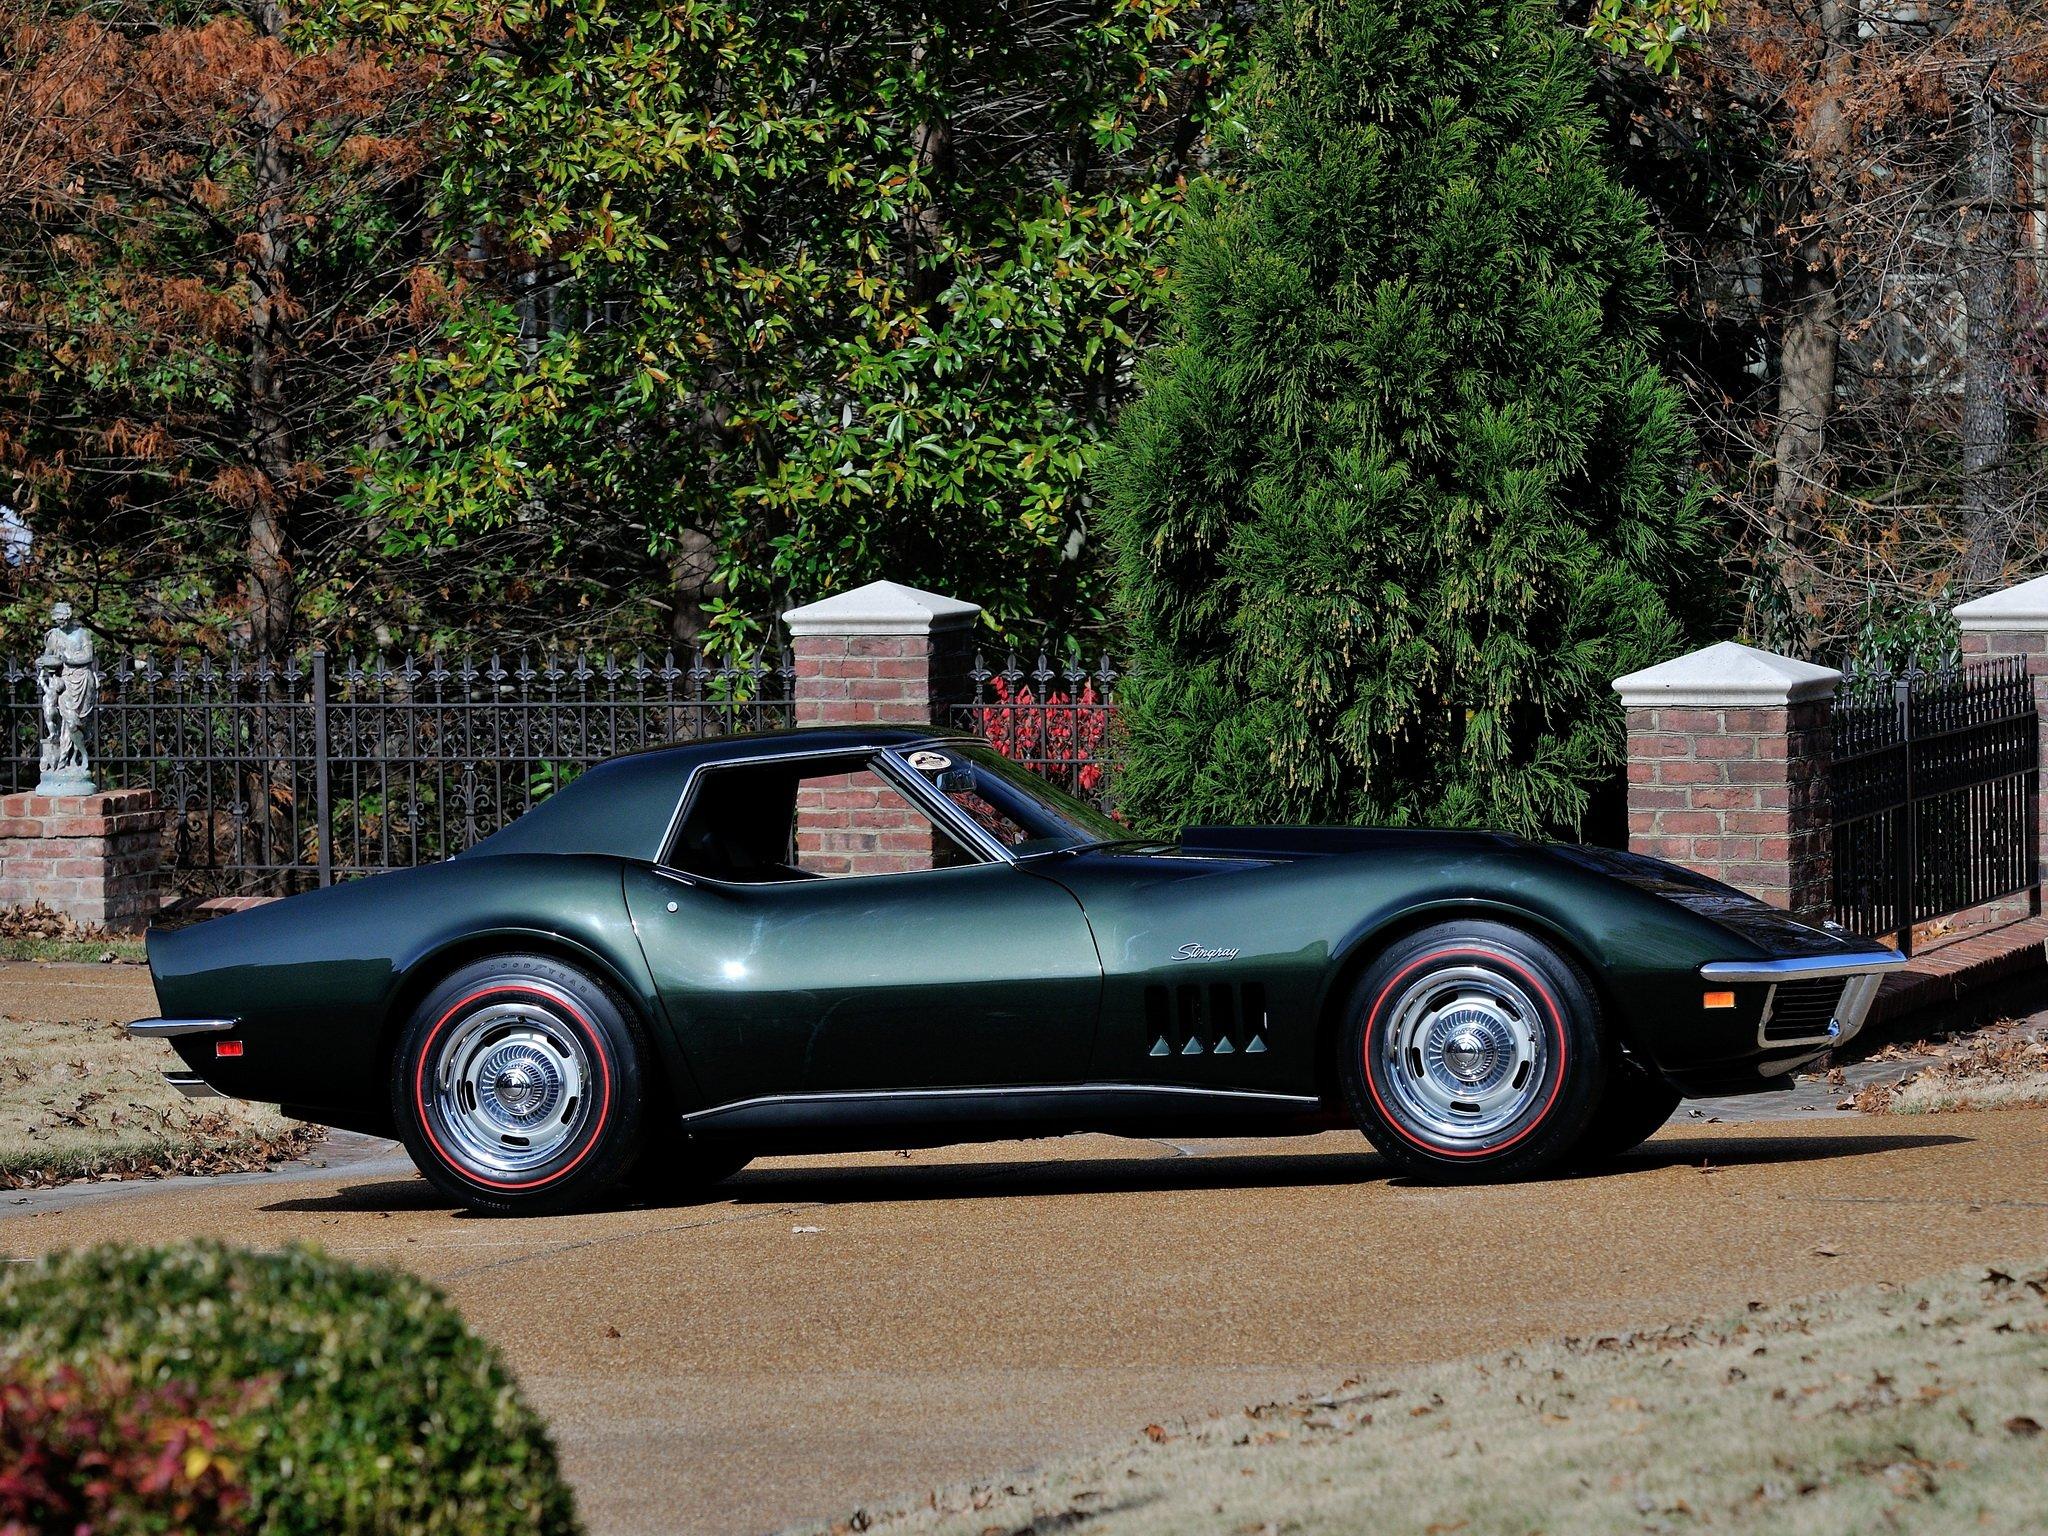 1969 Chevrolet Corvette Stingray L88 427 Convertible C 3